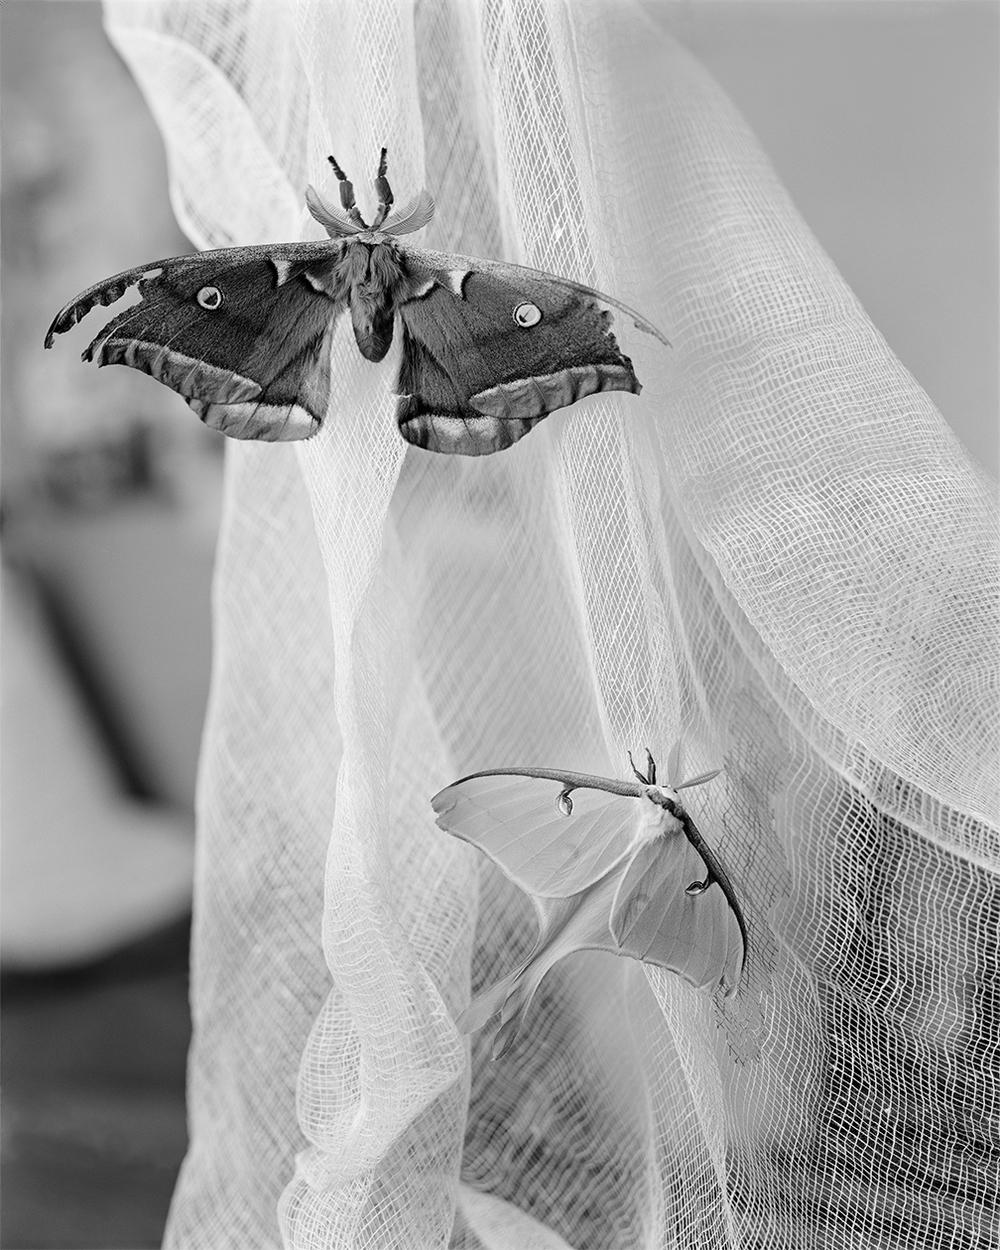 Actias Luna, Antheraea Polyphemus (2014)